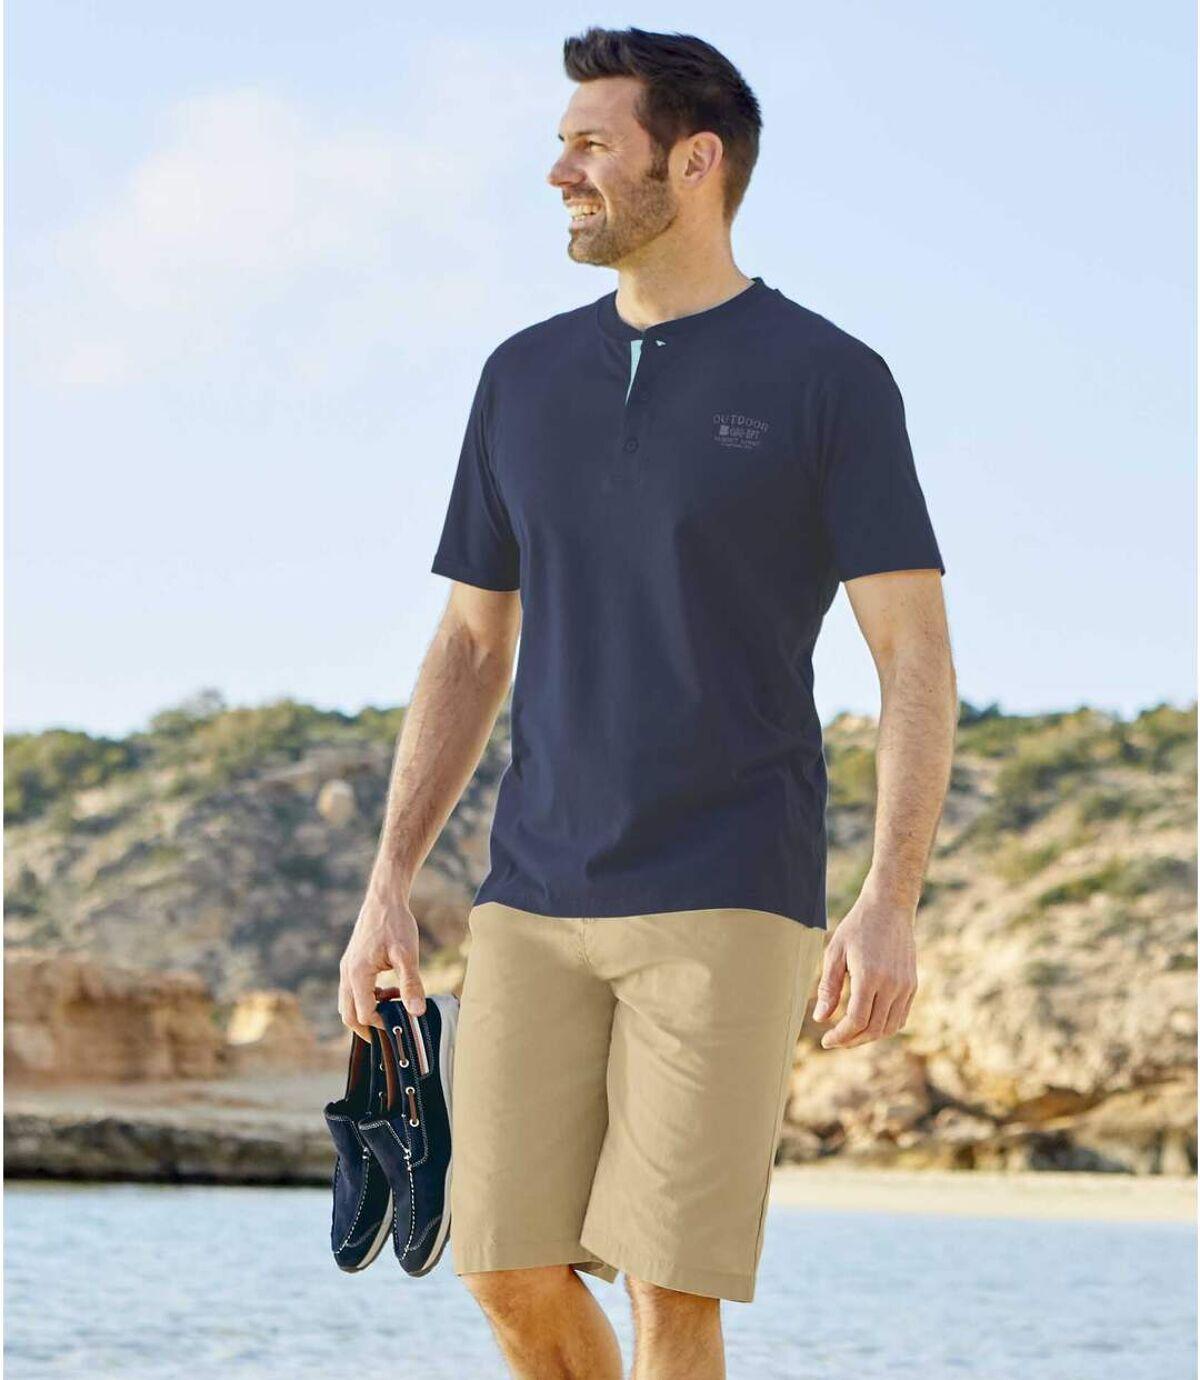 Pack of 2 Men's Canvas Shorts - Beige Navy Atlas For Men